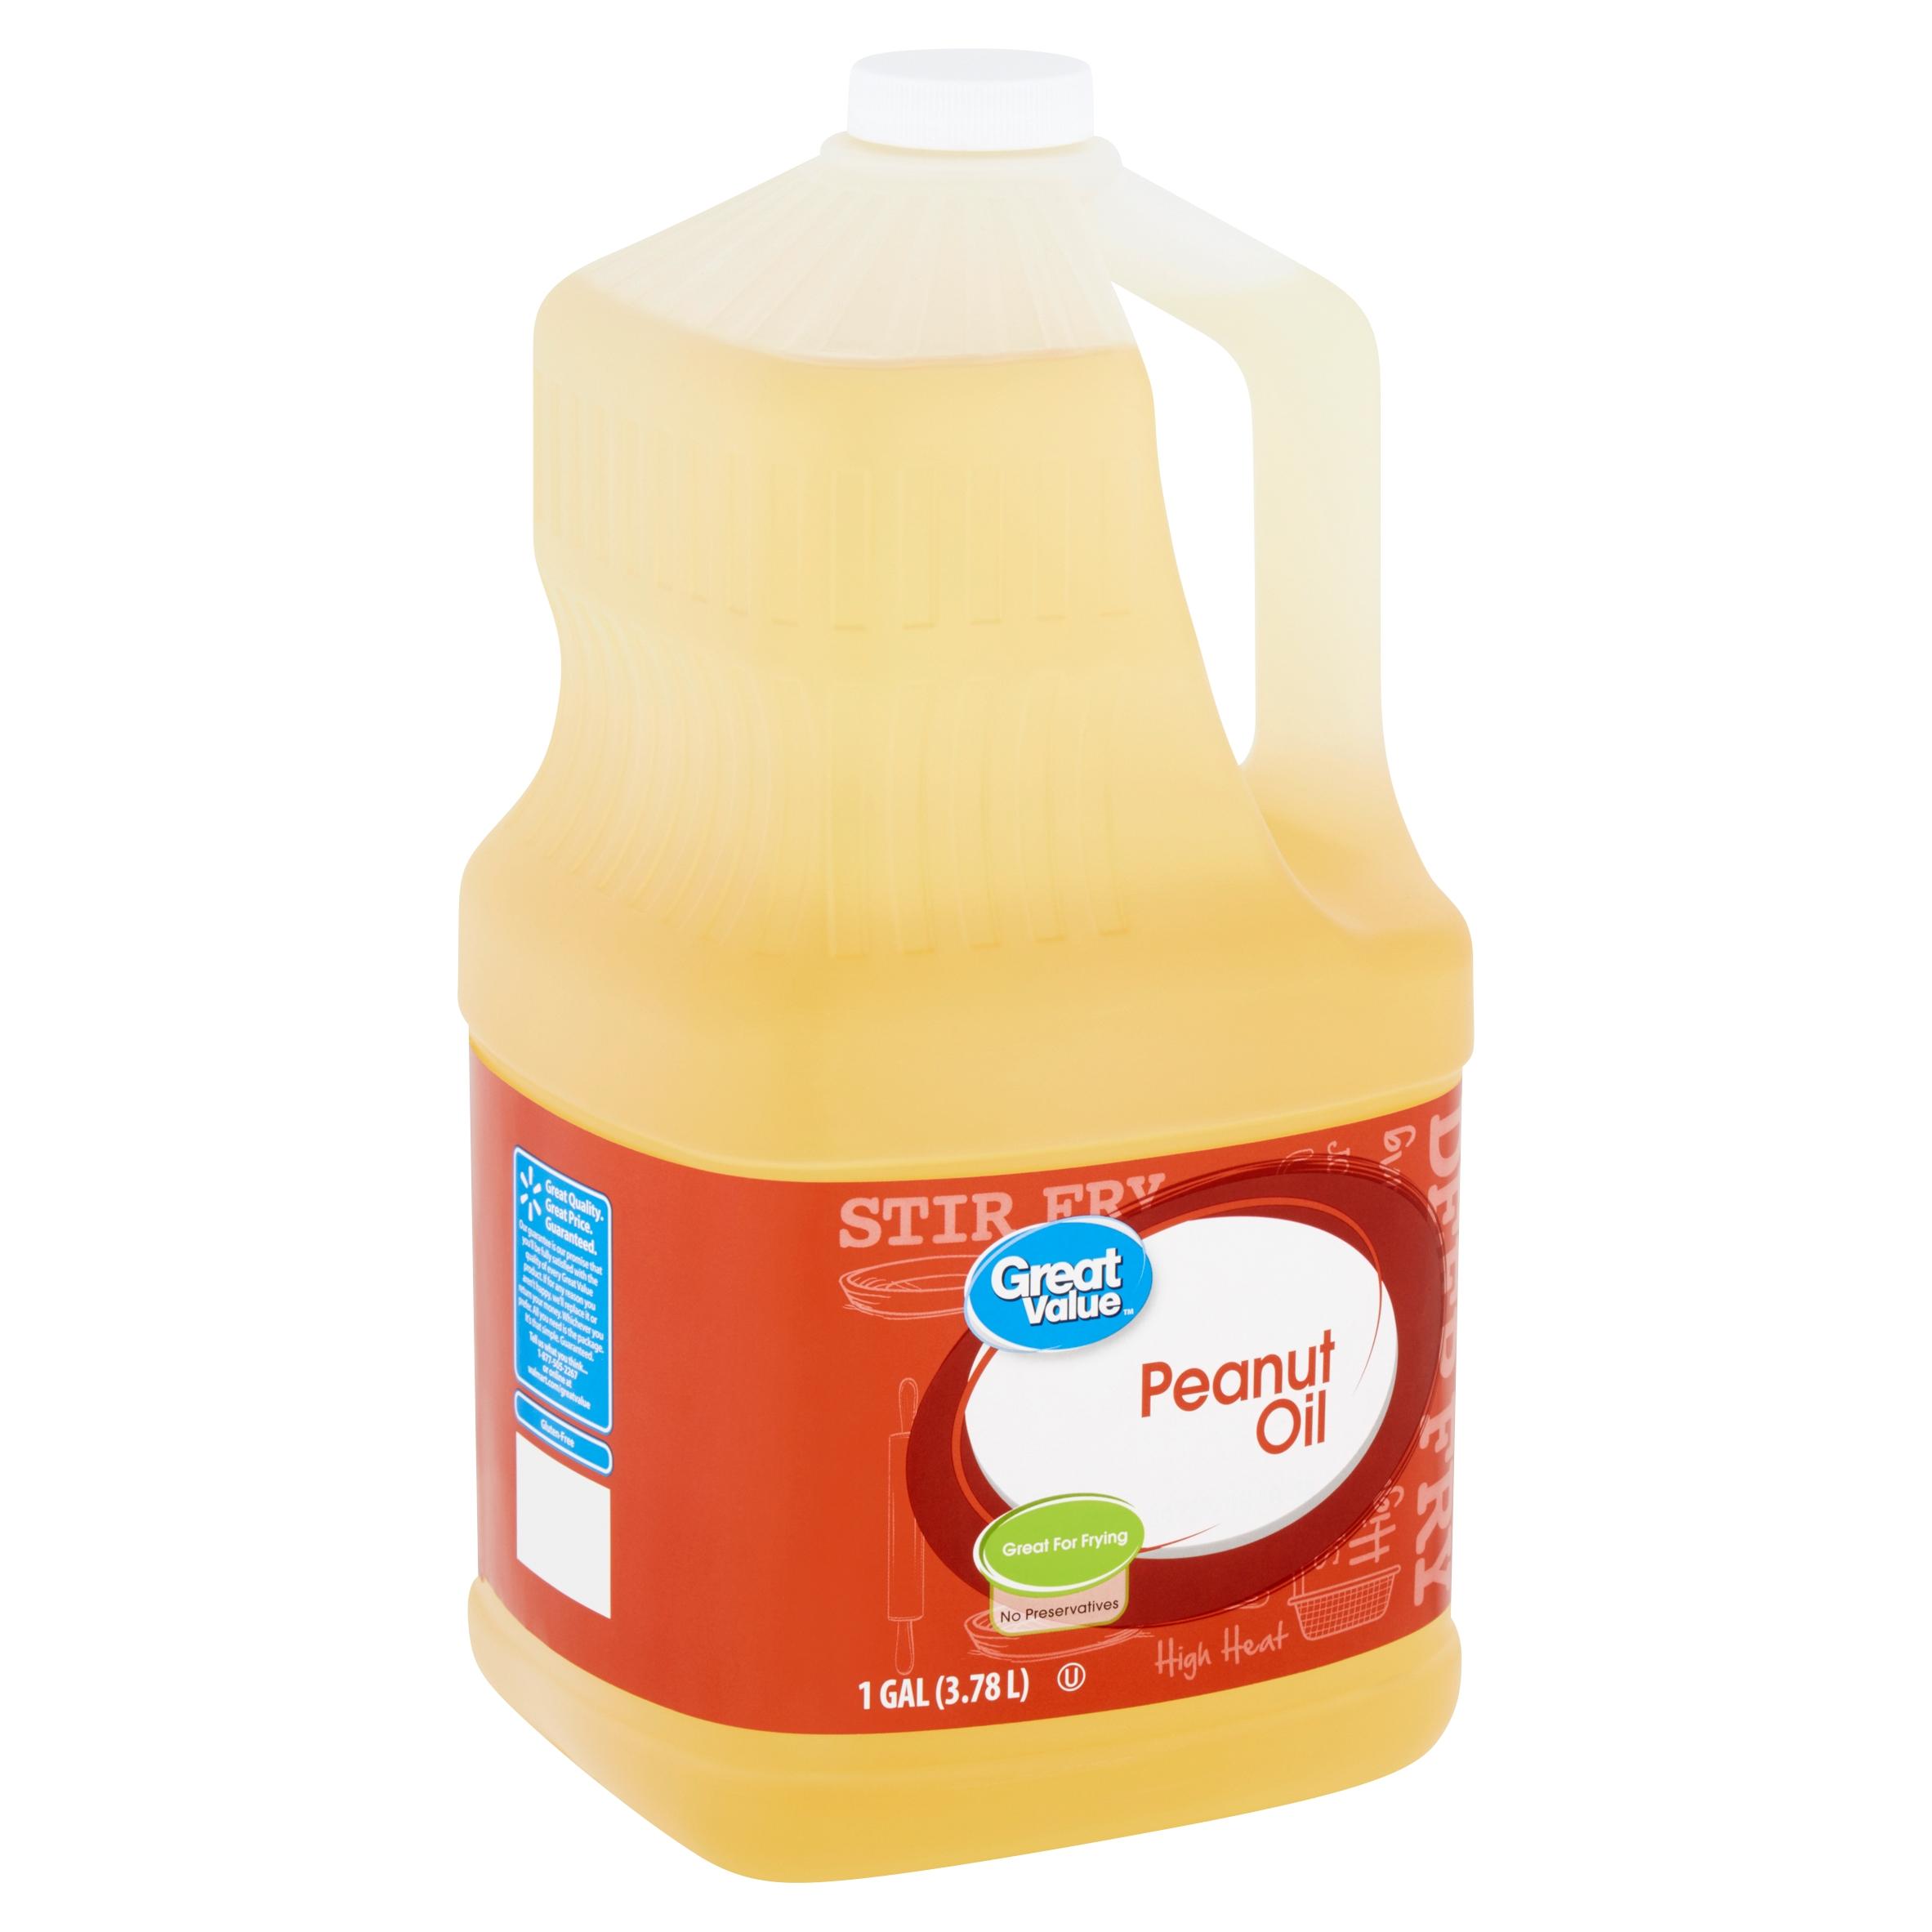 Great Value Peanut Oil, 1 gal